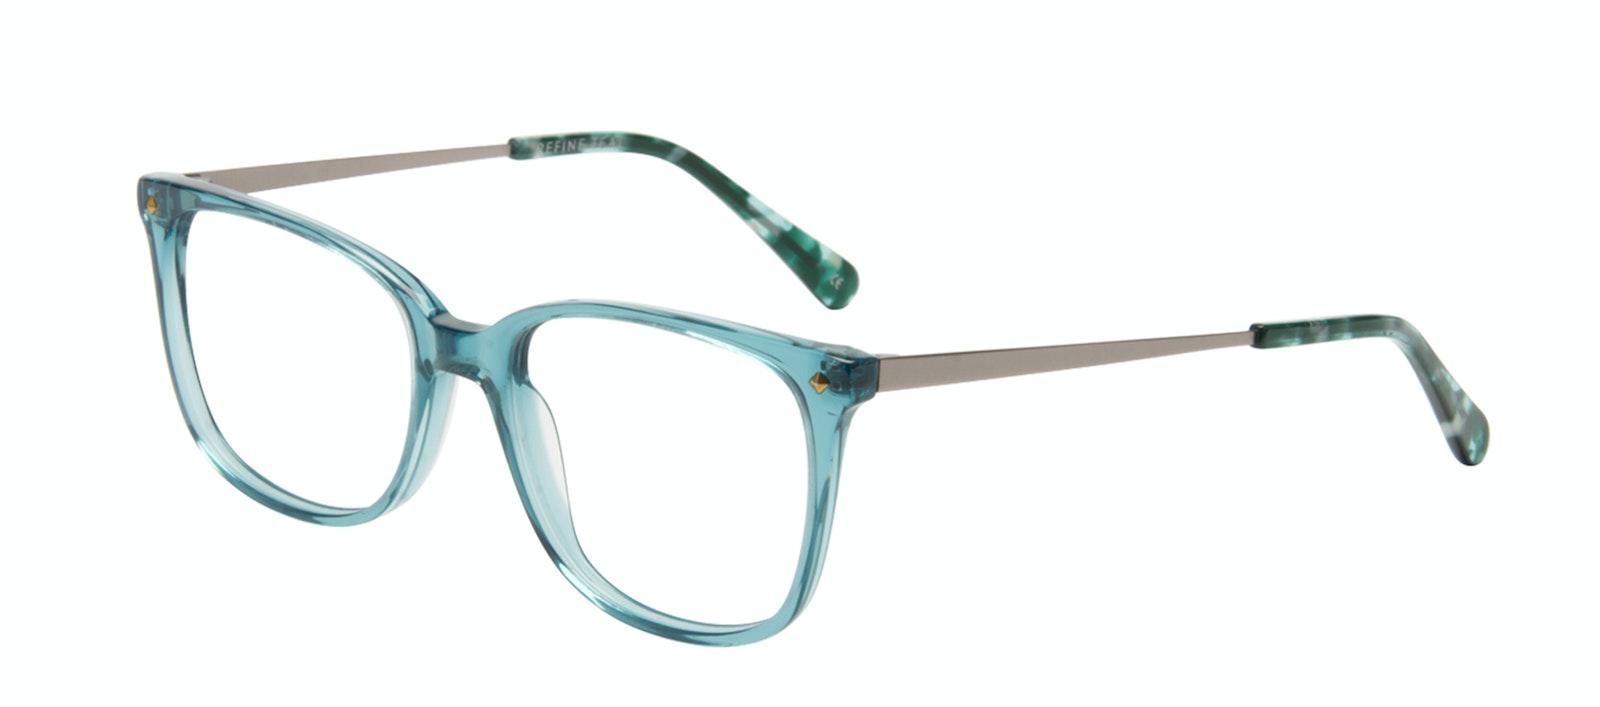 Affordable Fashion Glasses Rectangle Square Eyeglasses Women Refine Teal Tilt